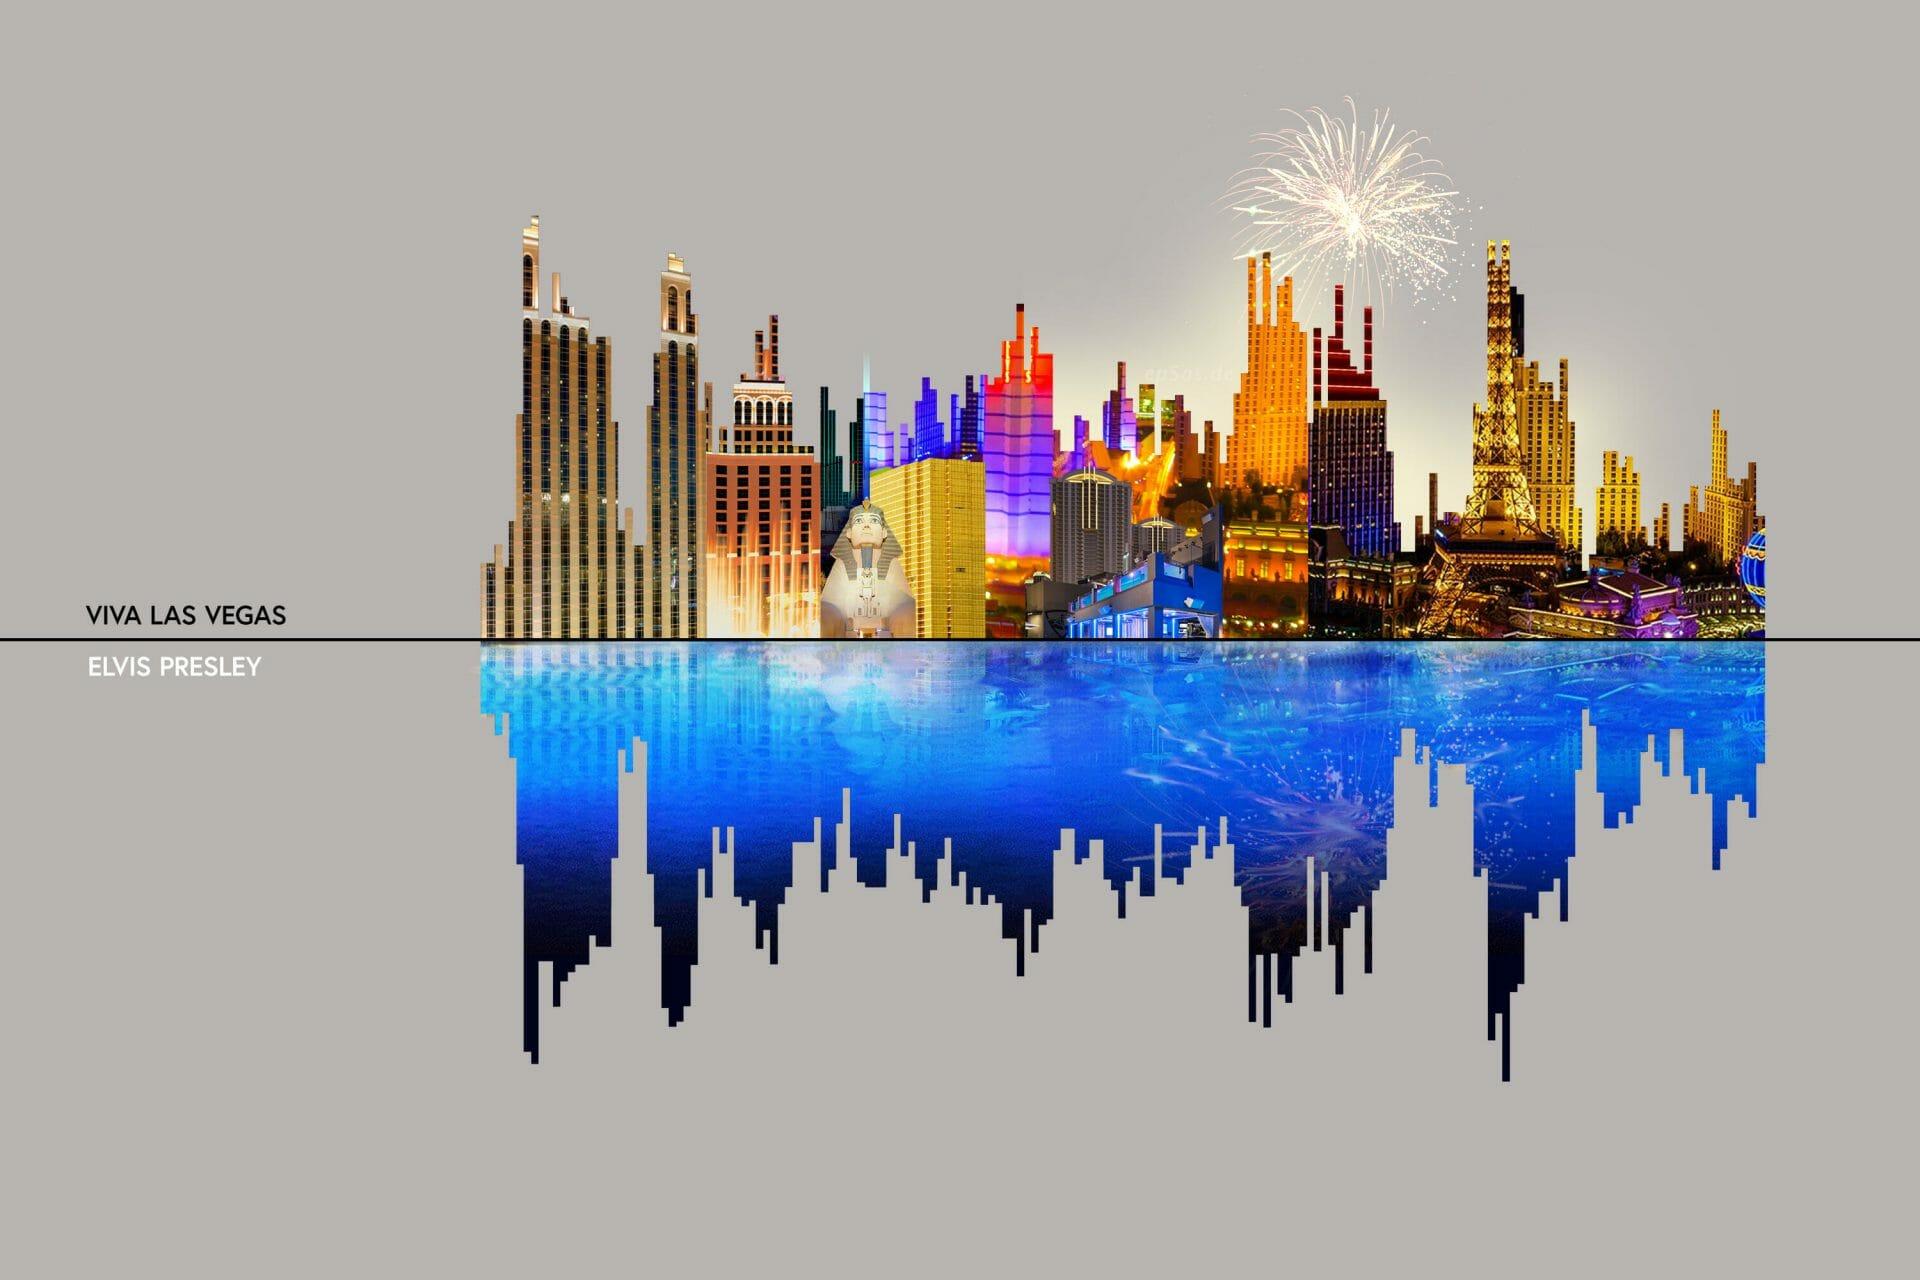 Las Vegas waveform